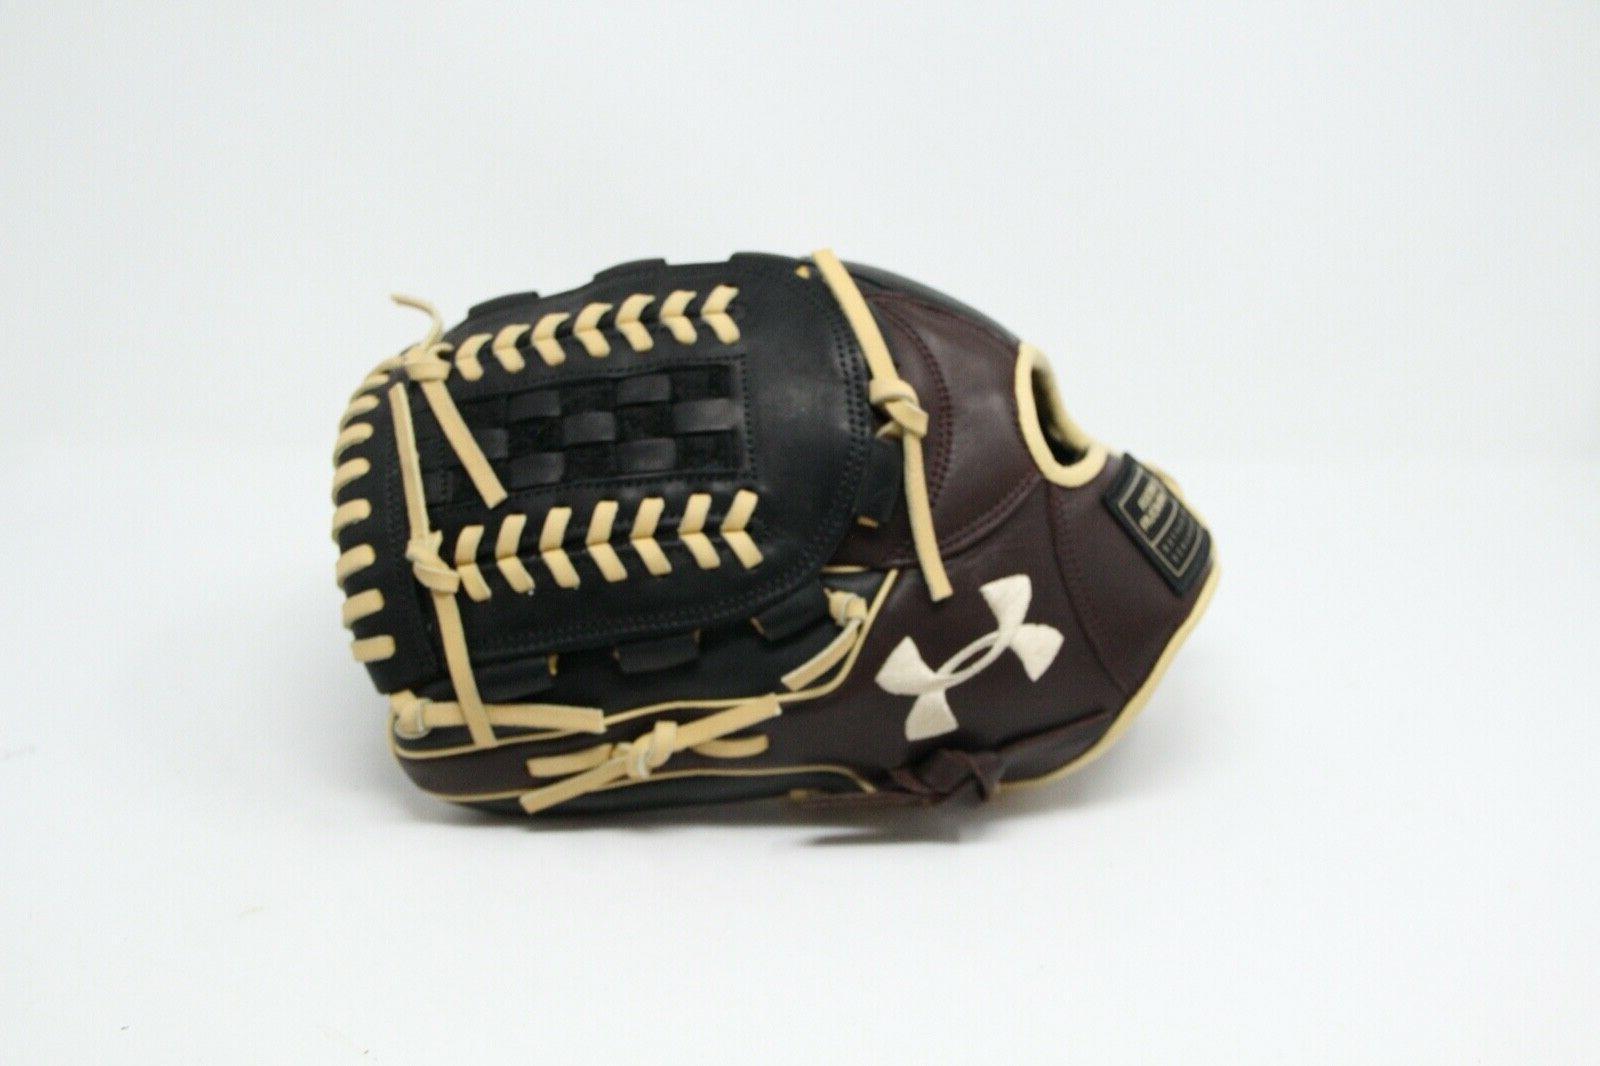 pro stock baseball glove ch 1200ds 12